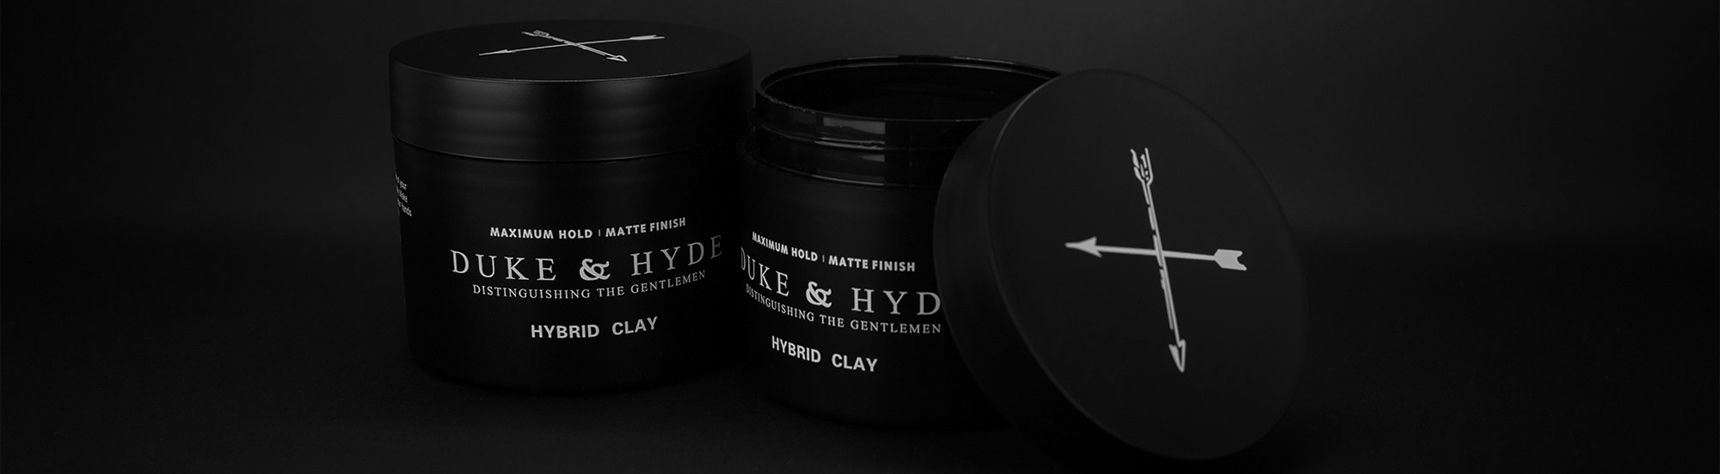 Duke & Hyde